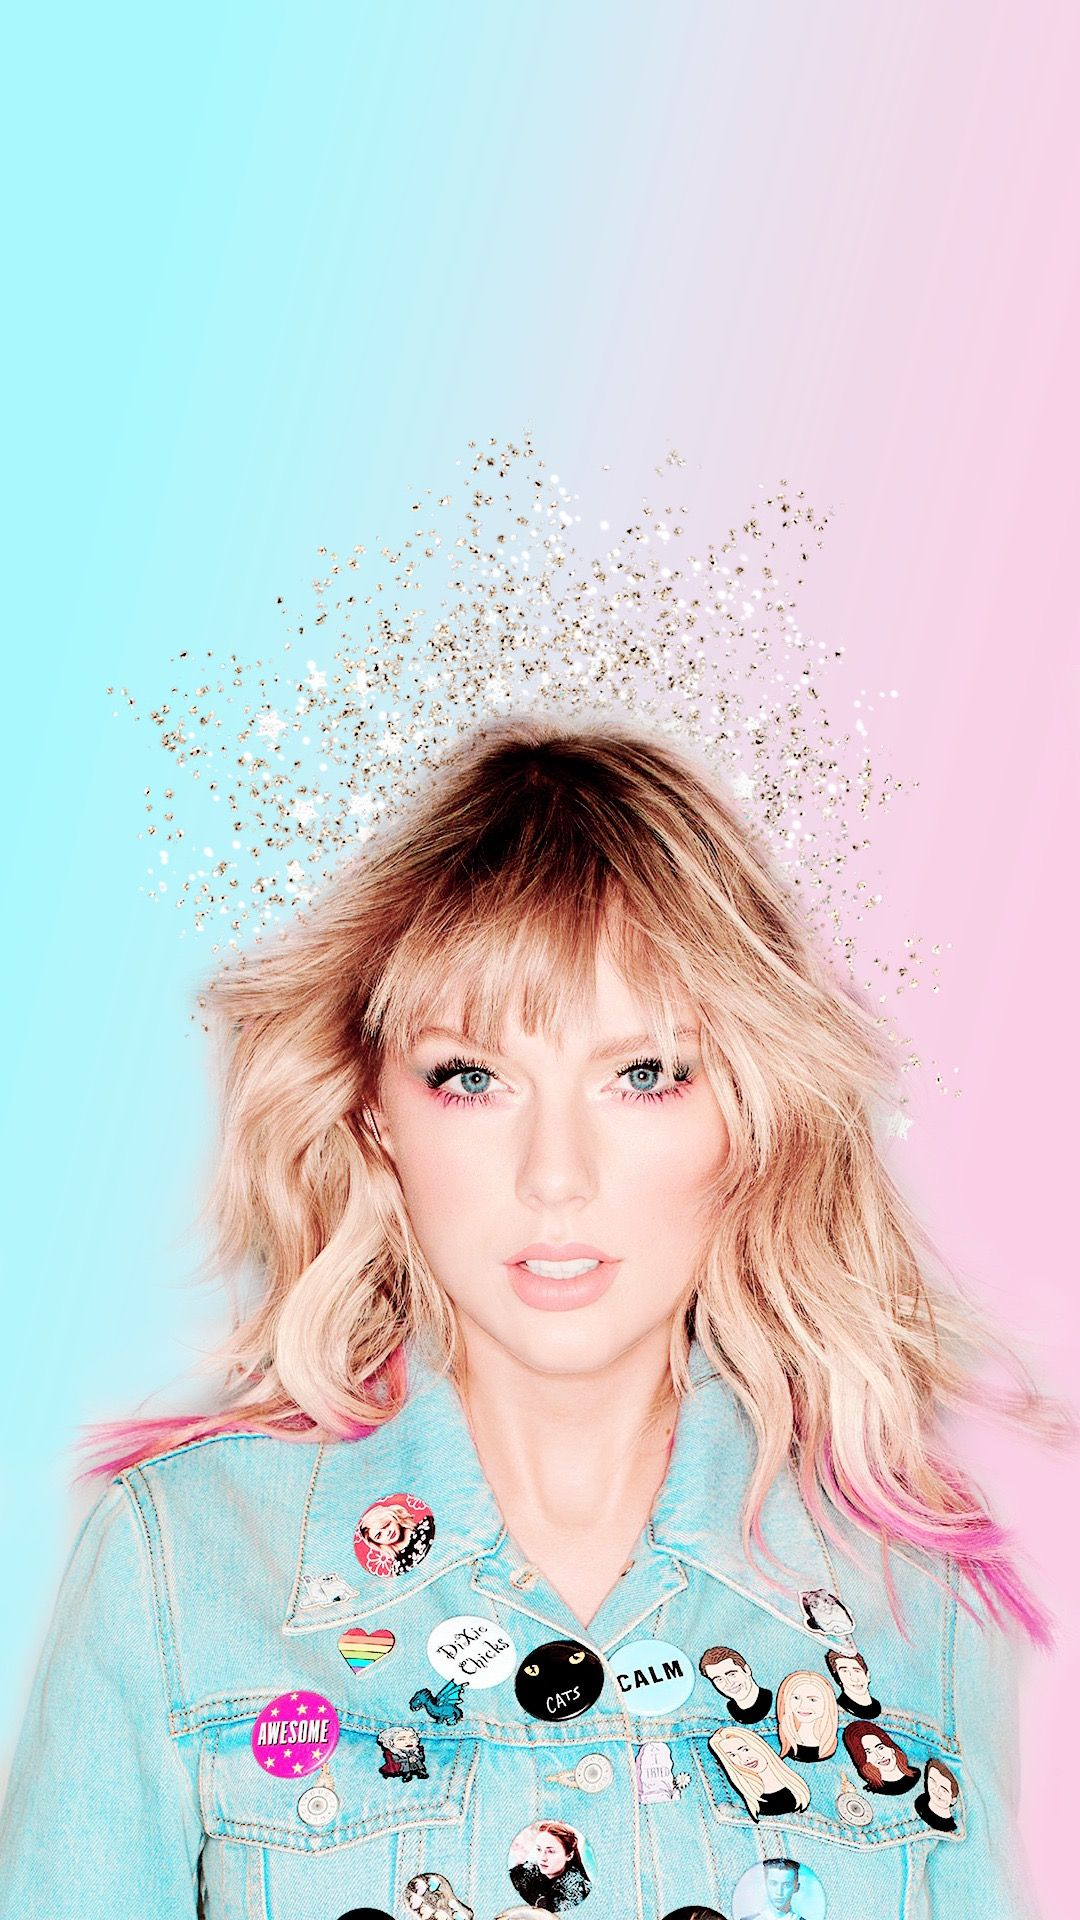 Pin De Lucas Angeloti Em Taylor Swift Com Imagens Taylor Swift